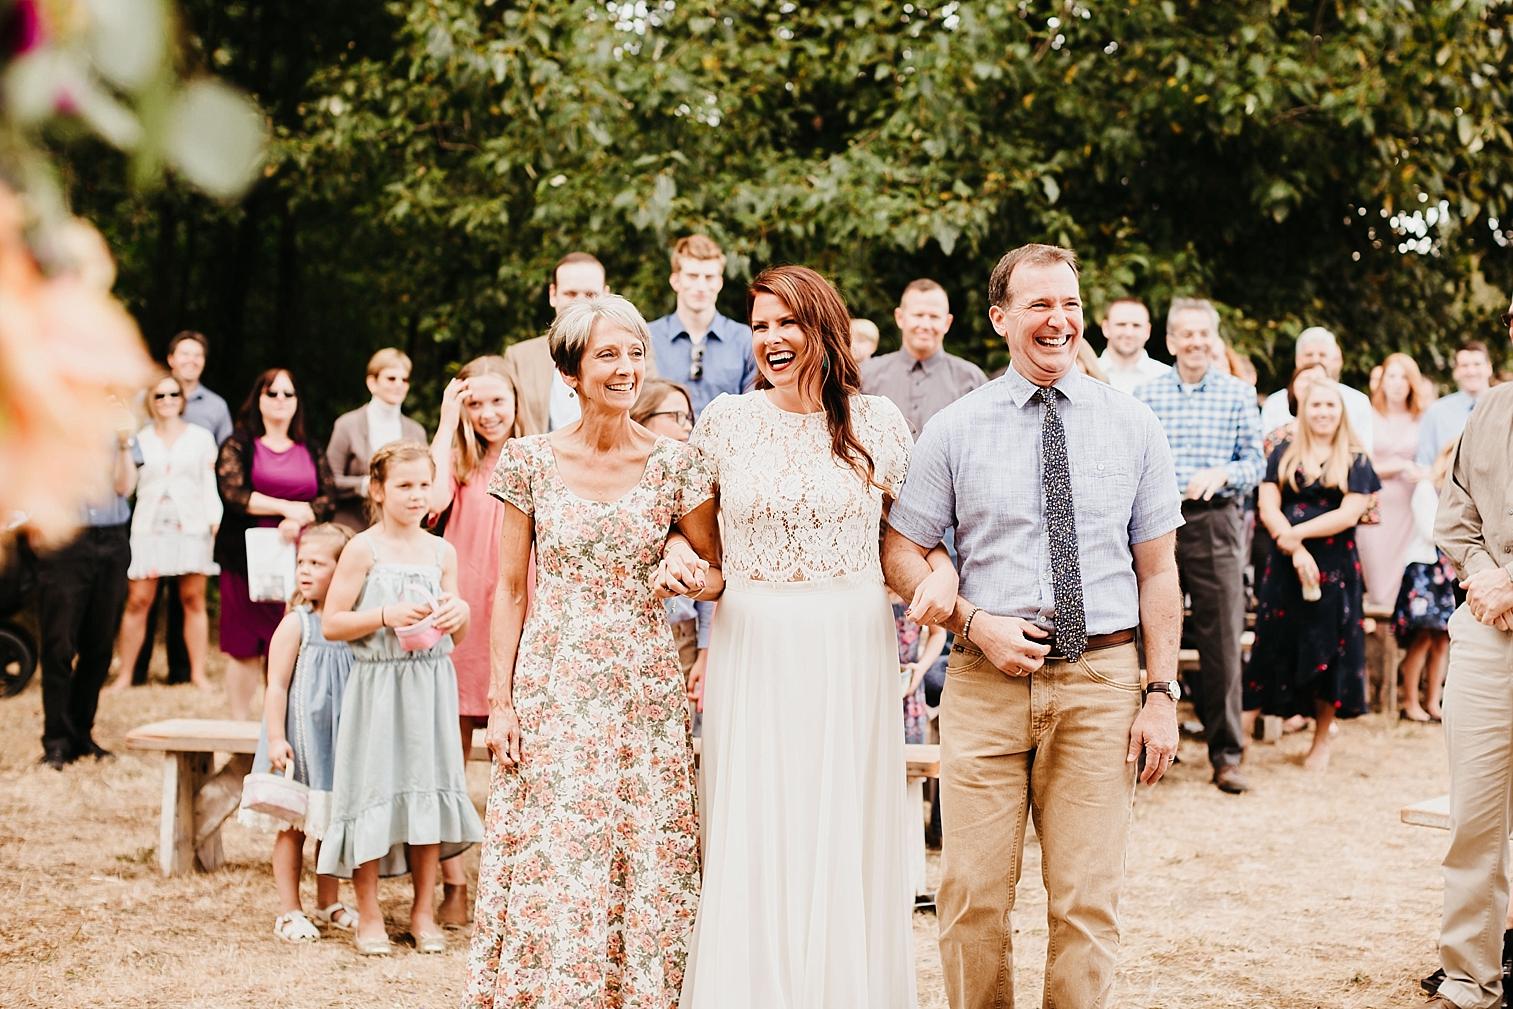 Summer-Camp-Themed-Wedding-81.jpg